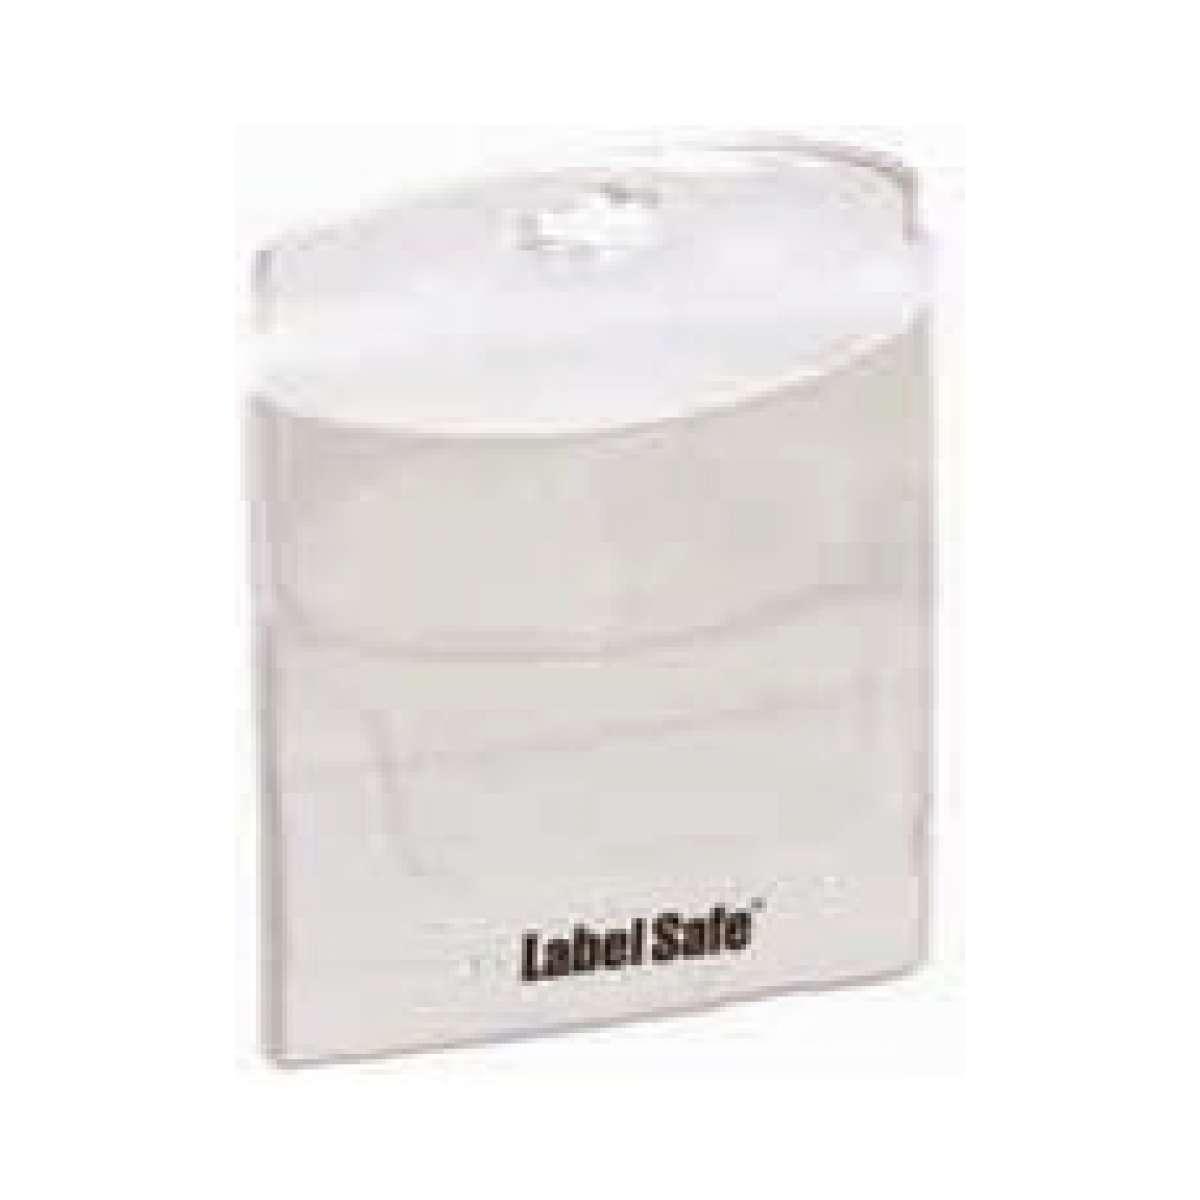 "Label Pocket (4"" X 3.5"")"